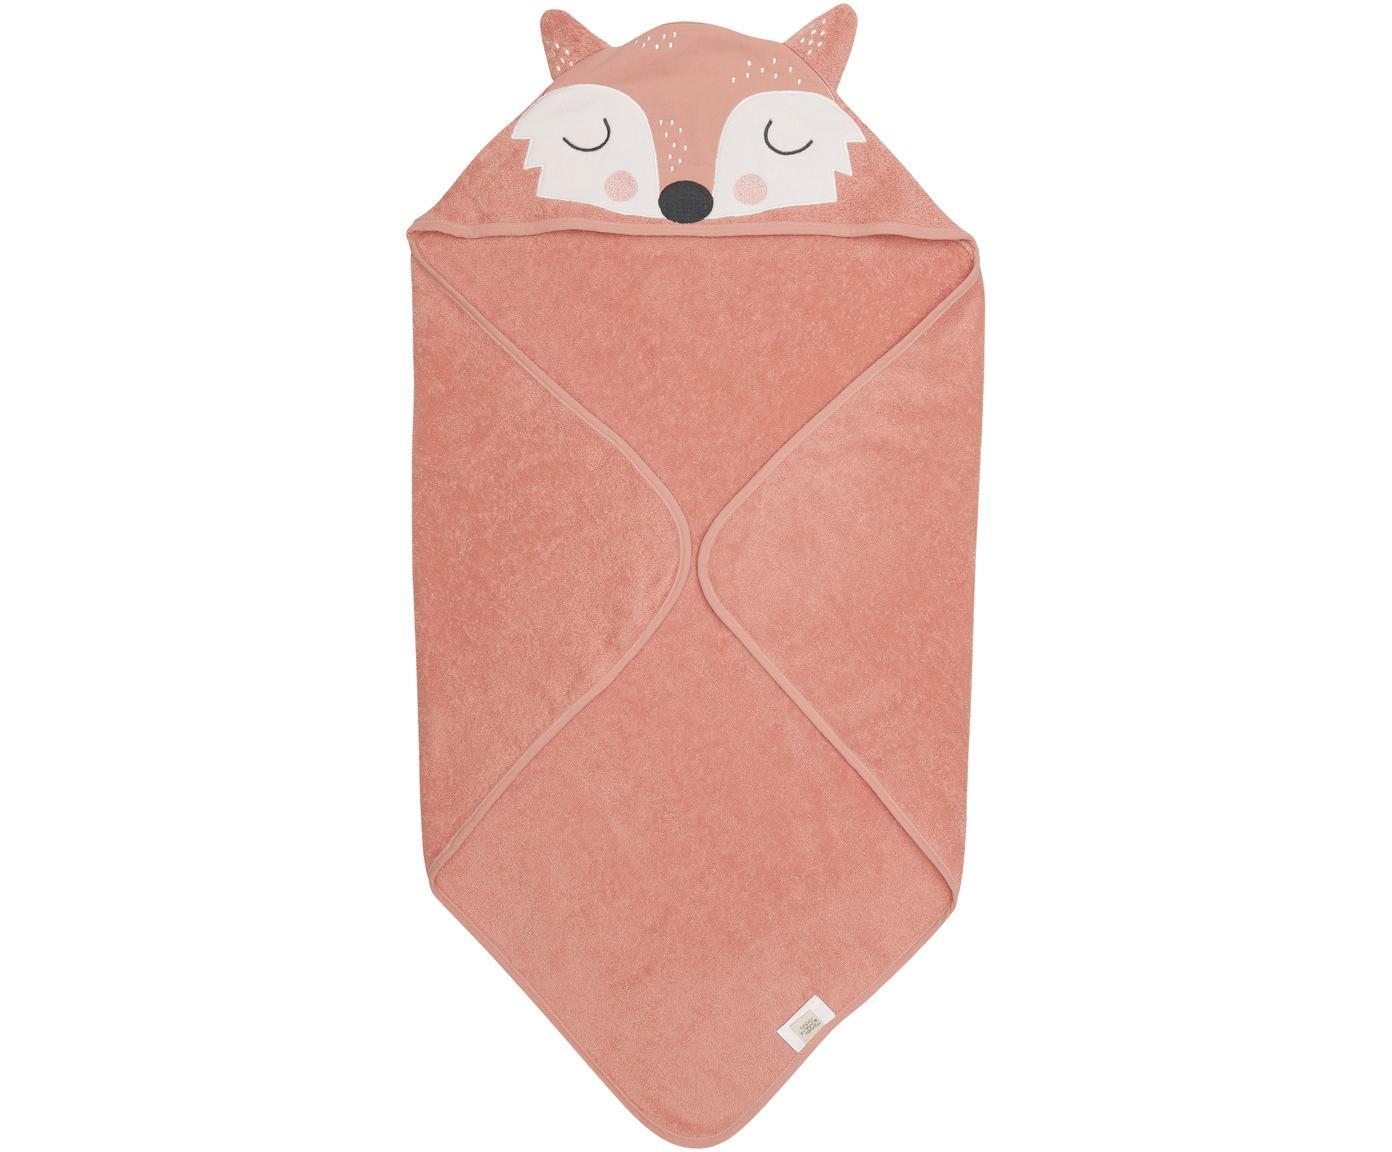 Toalla capa Fox Frida, Algodón ecológico, certificado GOTS, Rosa, blanco, negro, An 80 x L 80 cm